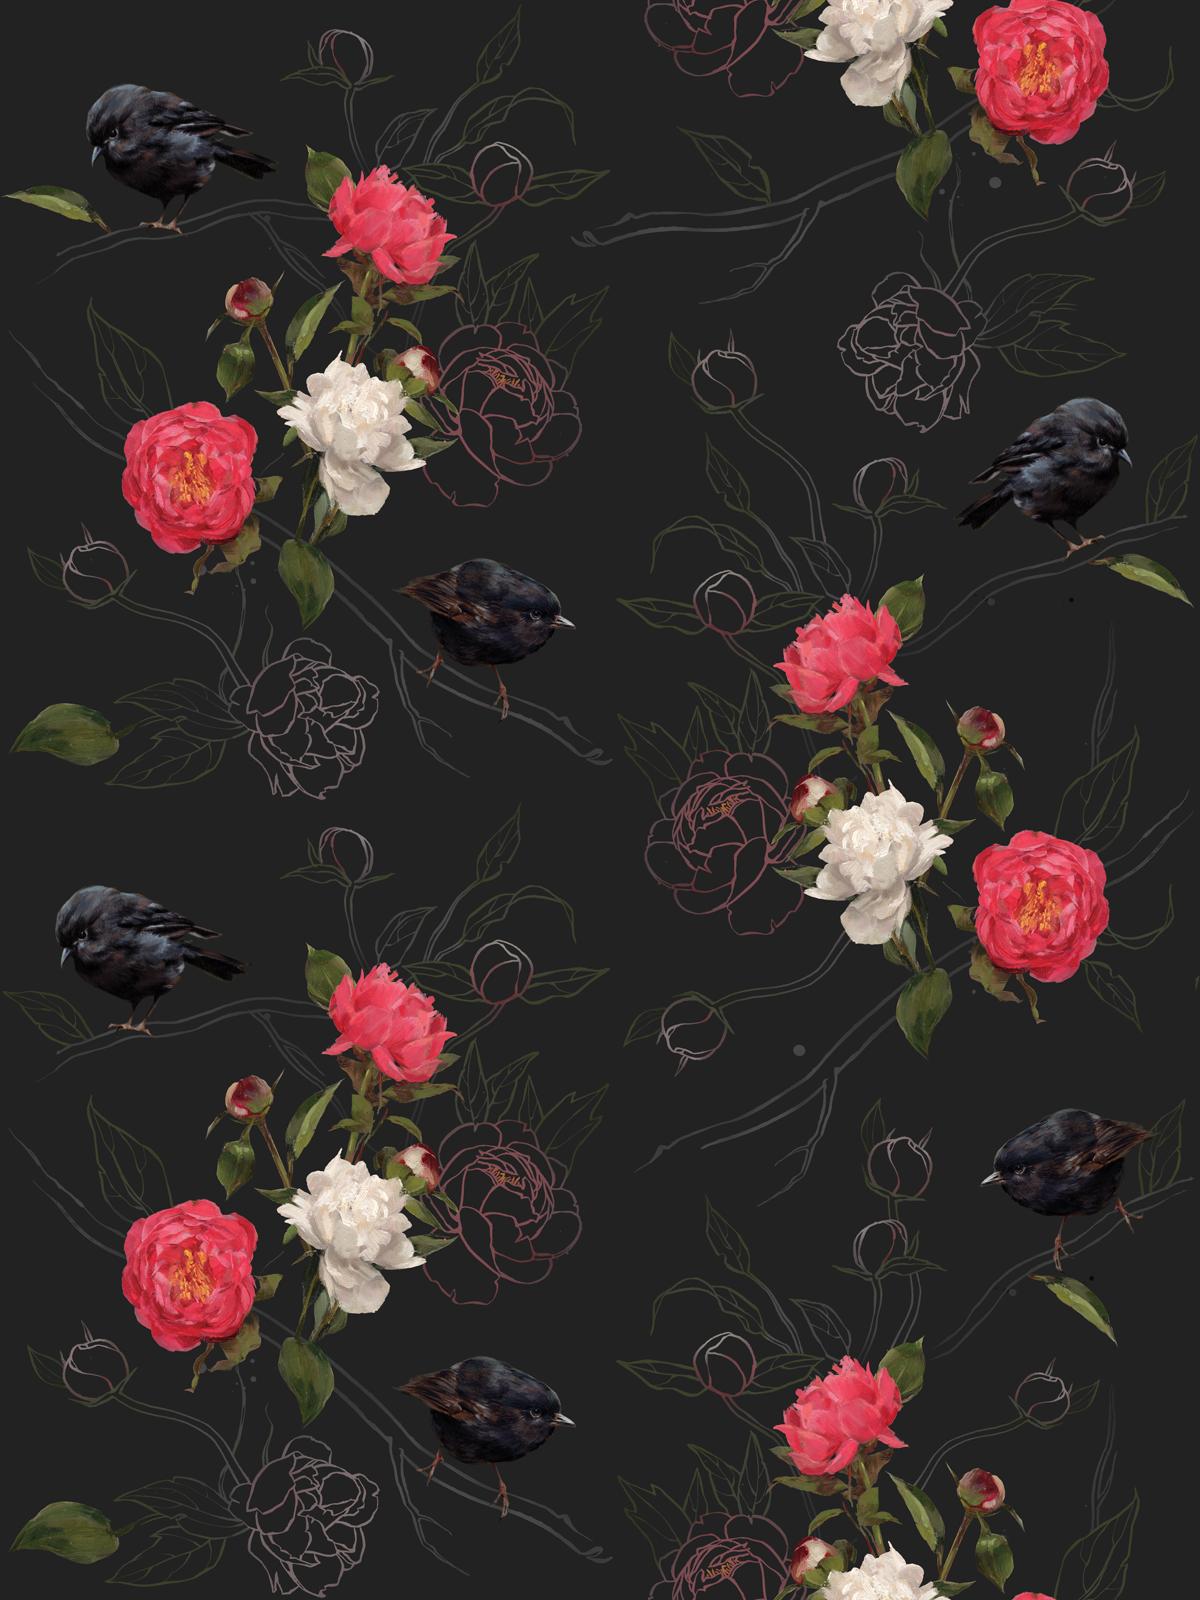 HALF FULL Black Robin I Deep Bloom Wallpaper, Flower